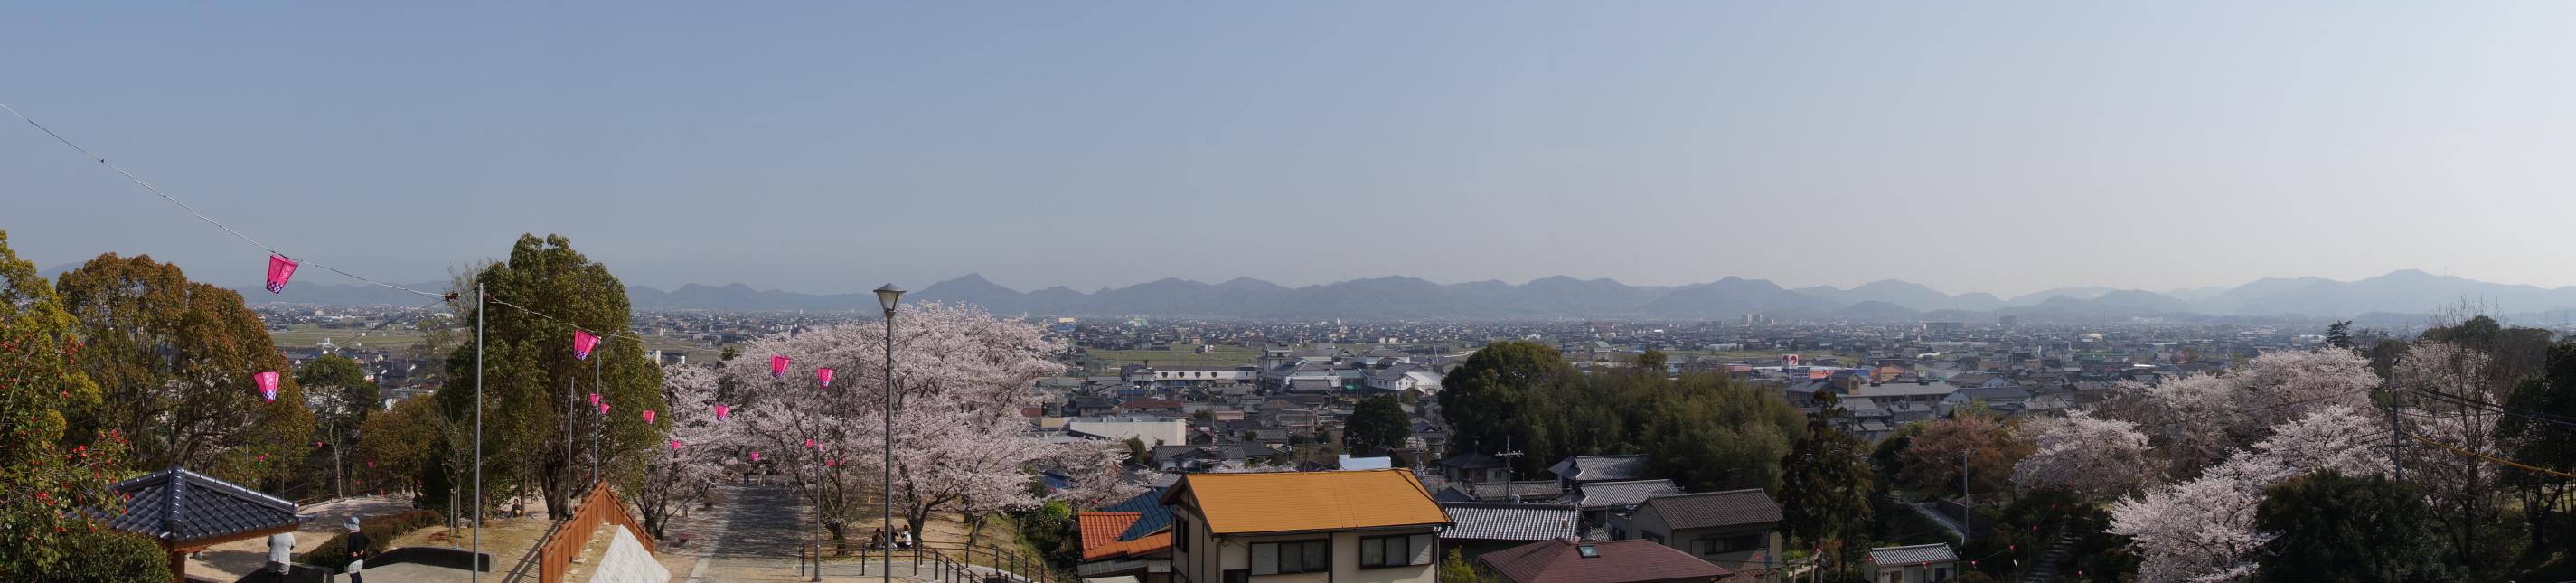 hayashima-town-panorama-from-hayashima-park